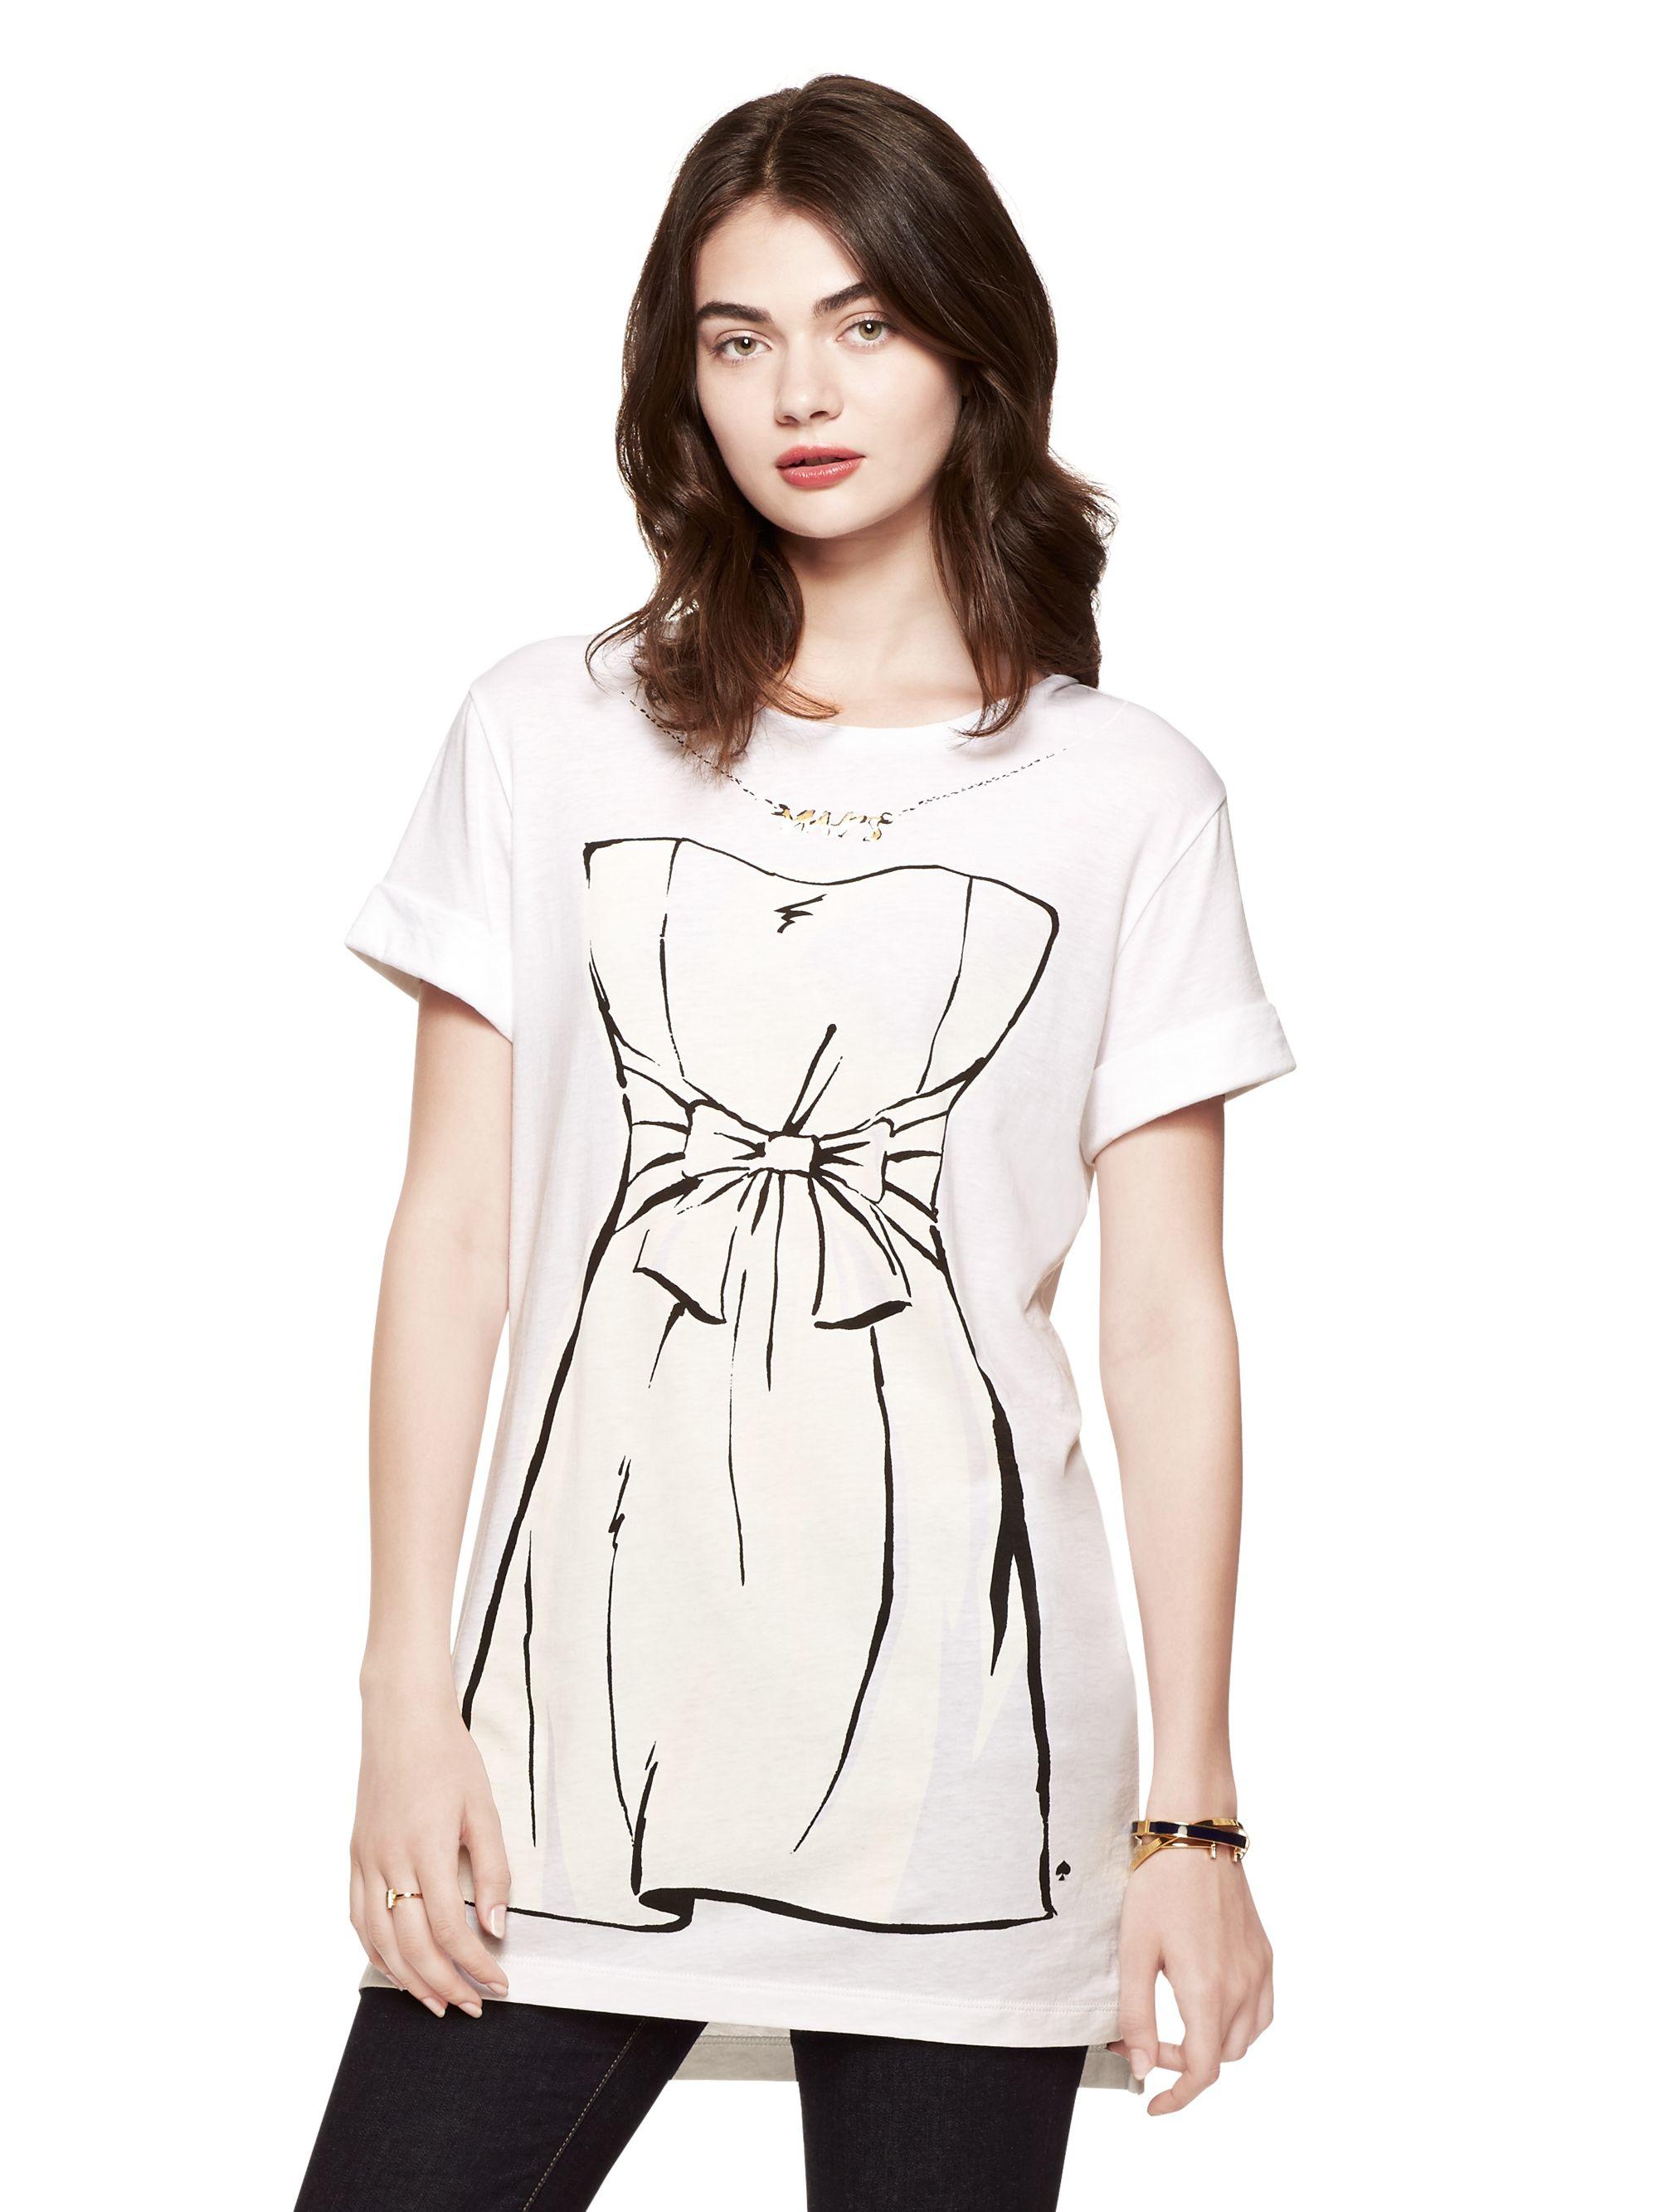 Lyst - Kate Spade New York Wedding Dress Tunic in White